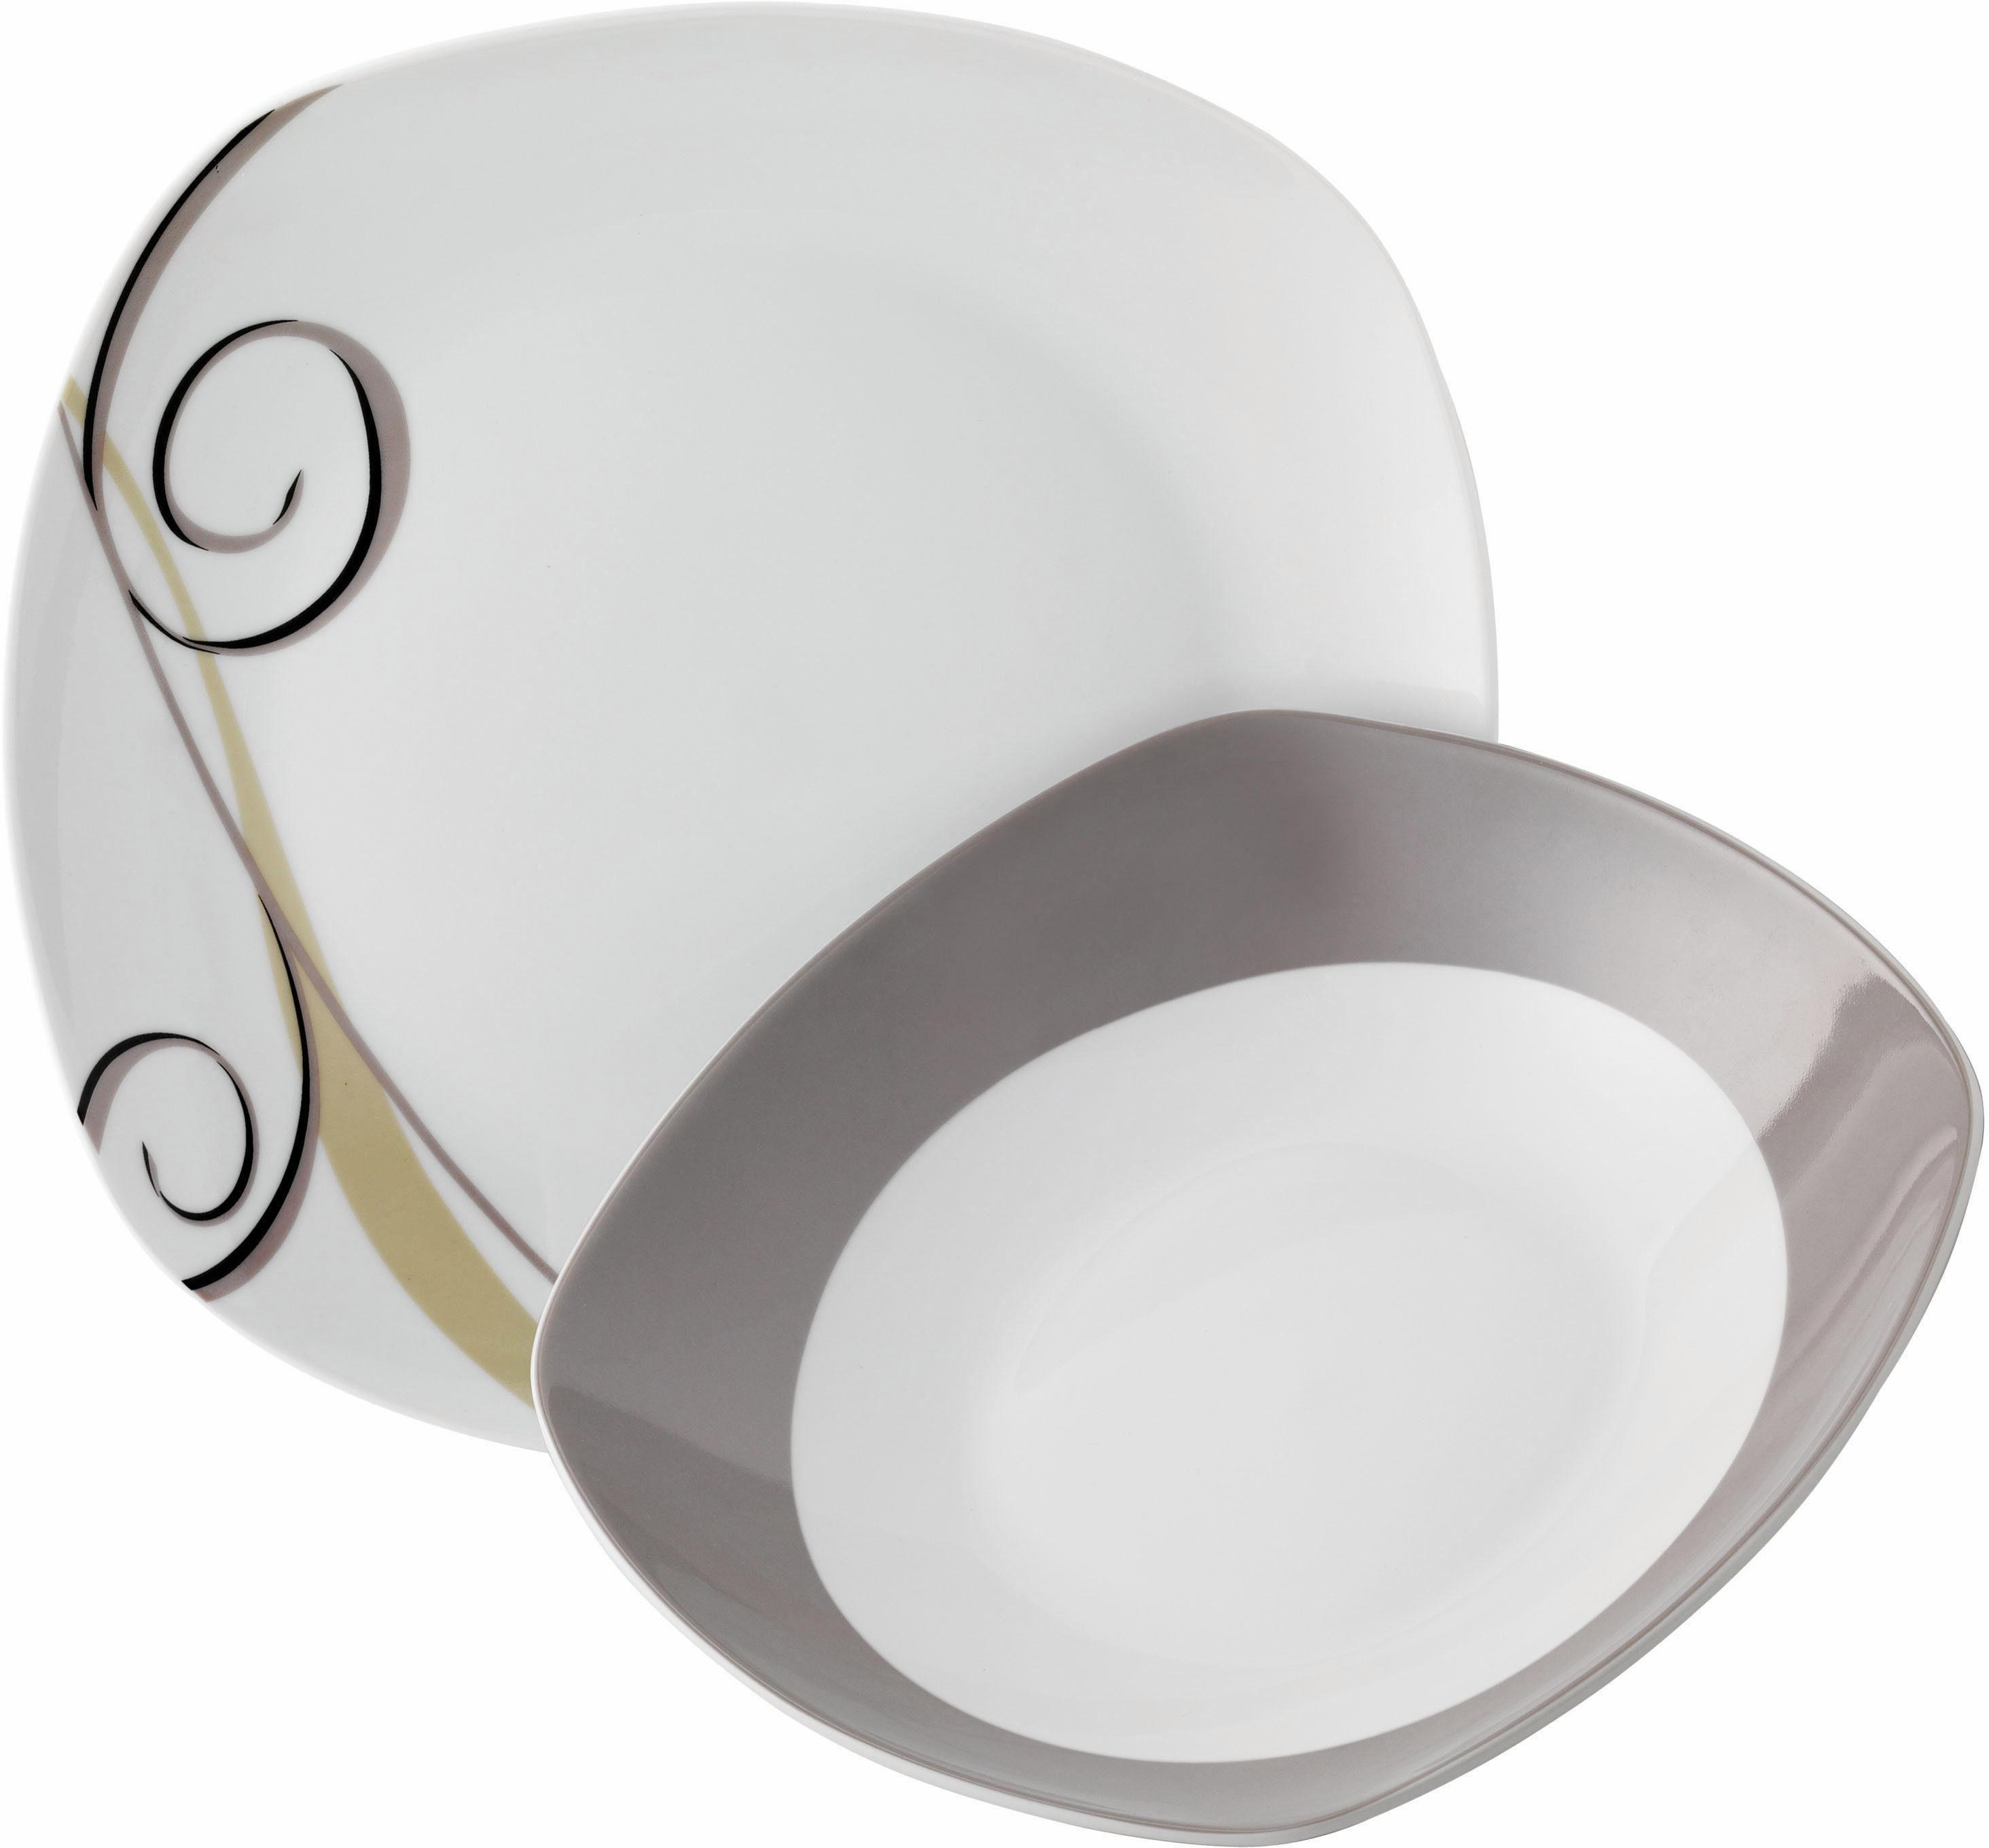 Van Well Tafelservice Porzellan, 12 Teile, »ALLEGRO«